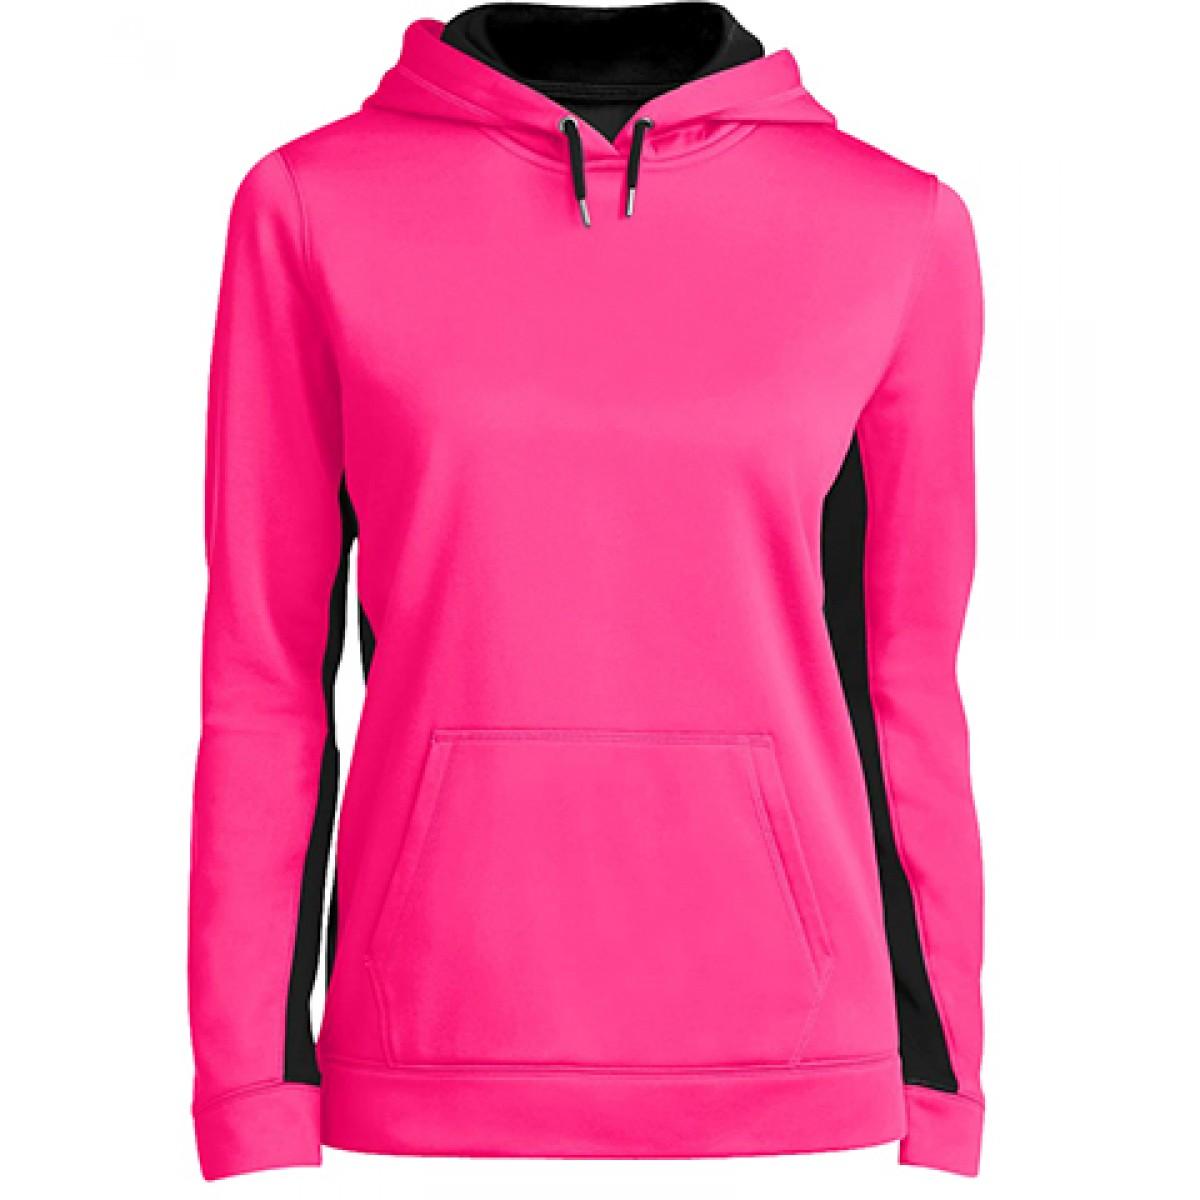 Ladies Colorblock Hooded Pullover-Neon Pink Black-2XL